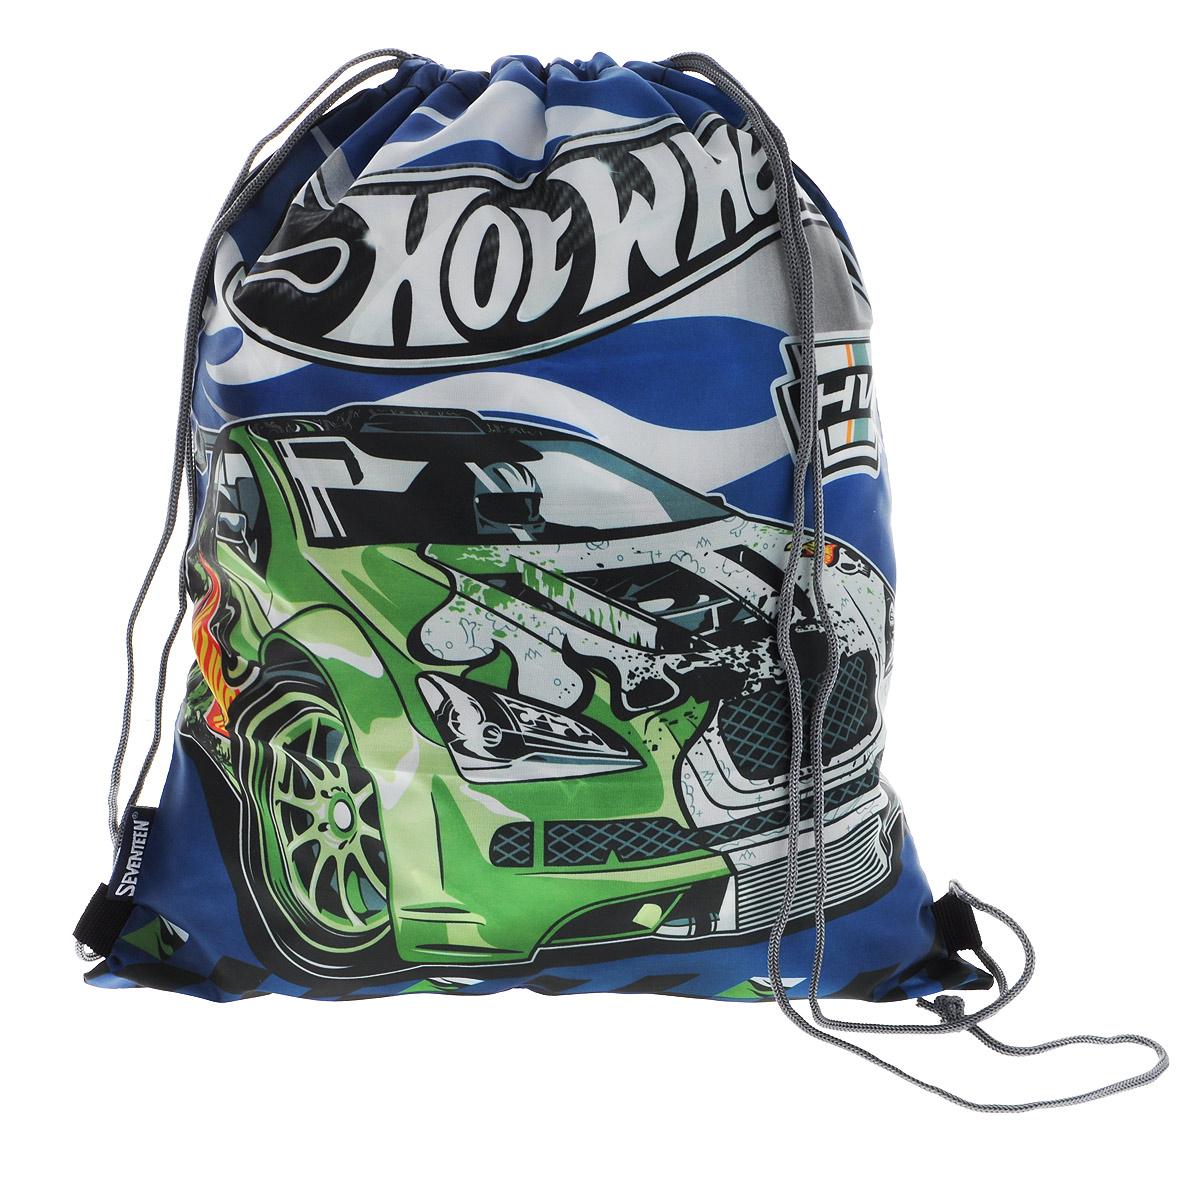 Hot Wheels Сумка-рюкзак для обуви цвет темно-синий зеленый HWCB-UT1-883